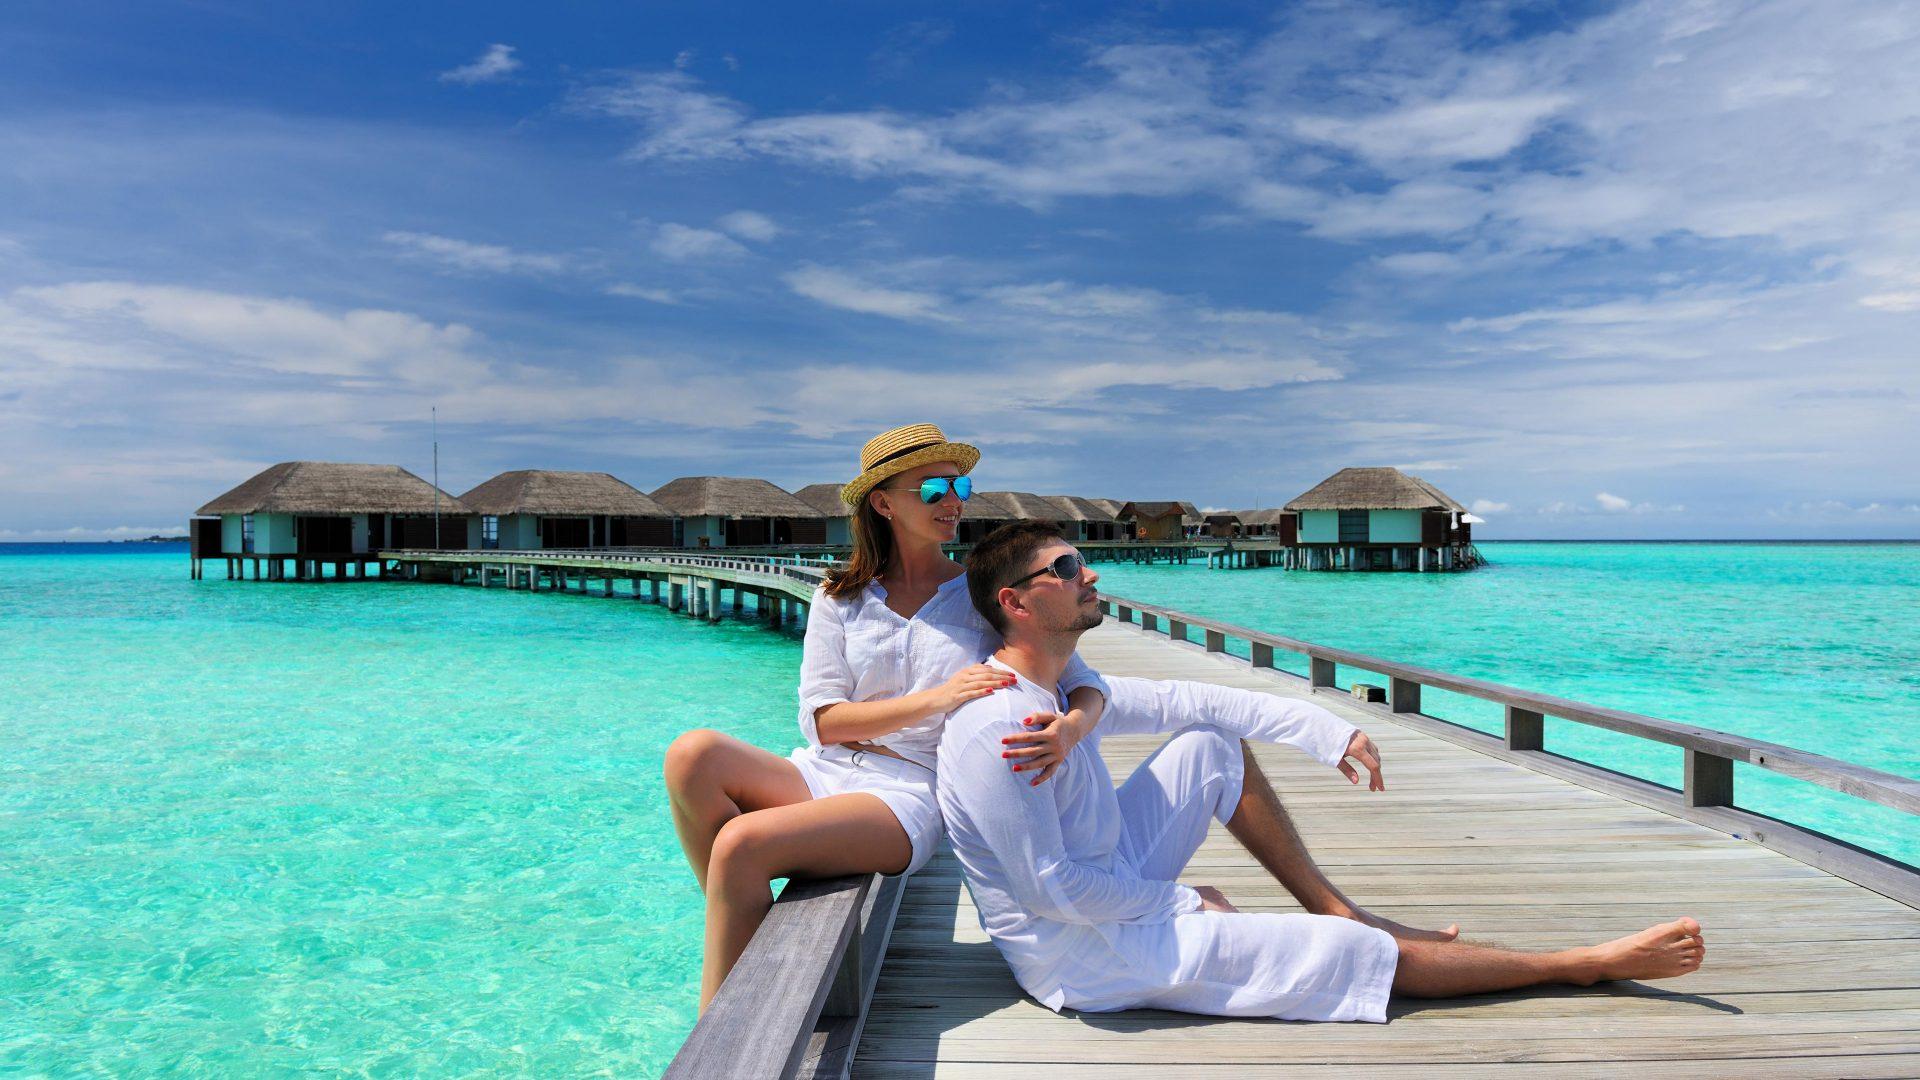 7 Tempat romantis di Asia yang wajib dikunjungi untuk bulan madu